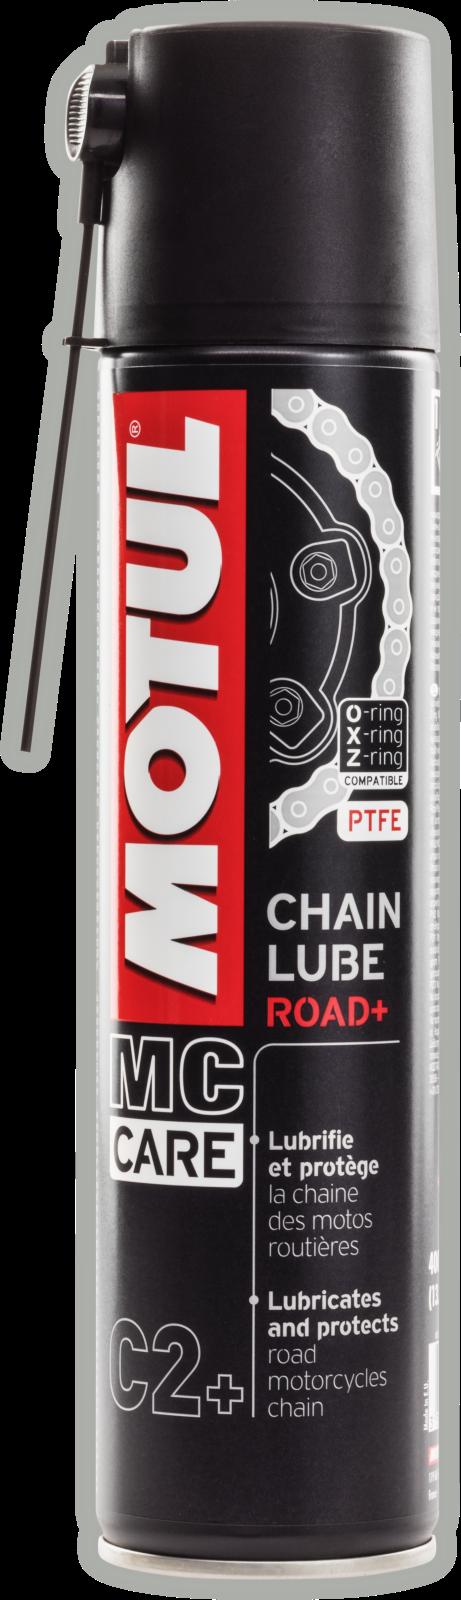 MOTUL AG MOTUL C2+ Chain Lube Road Plus 0,4L teflonos